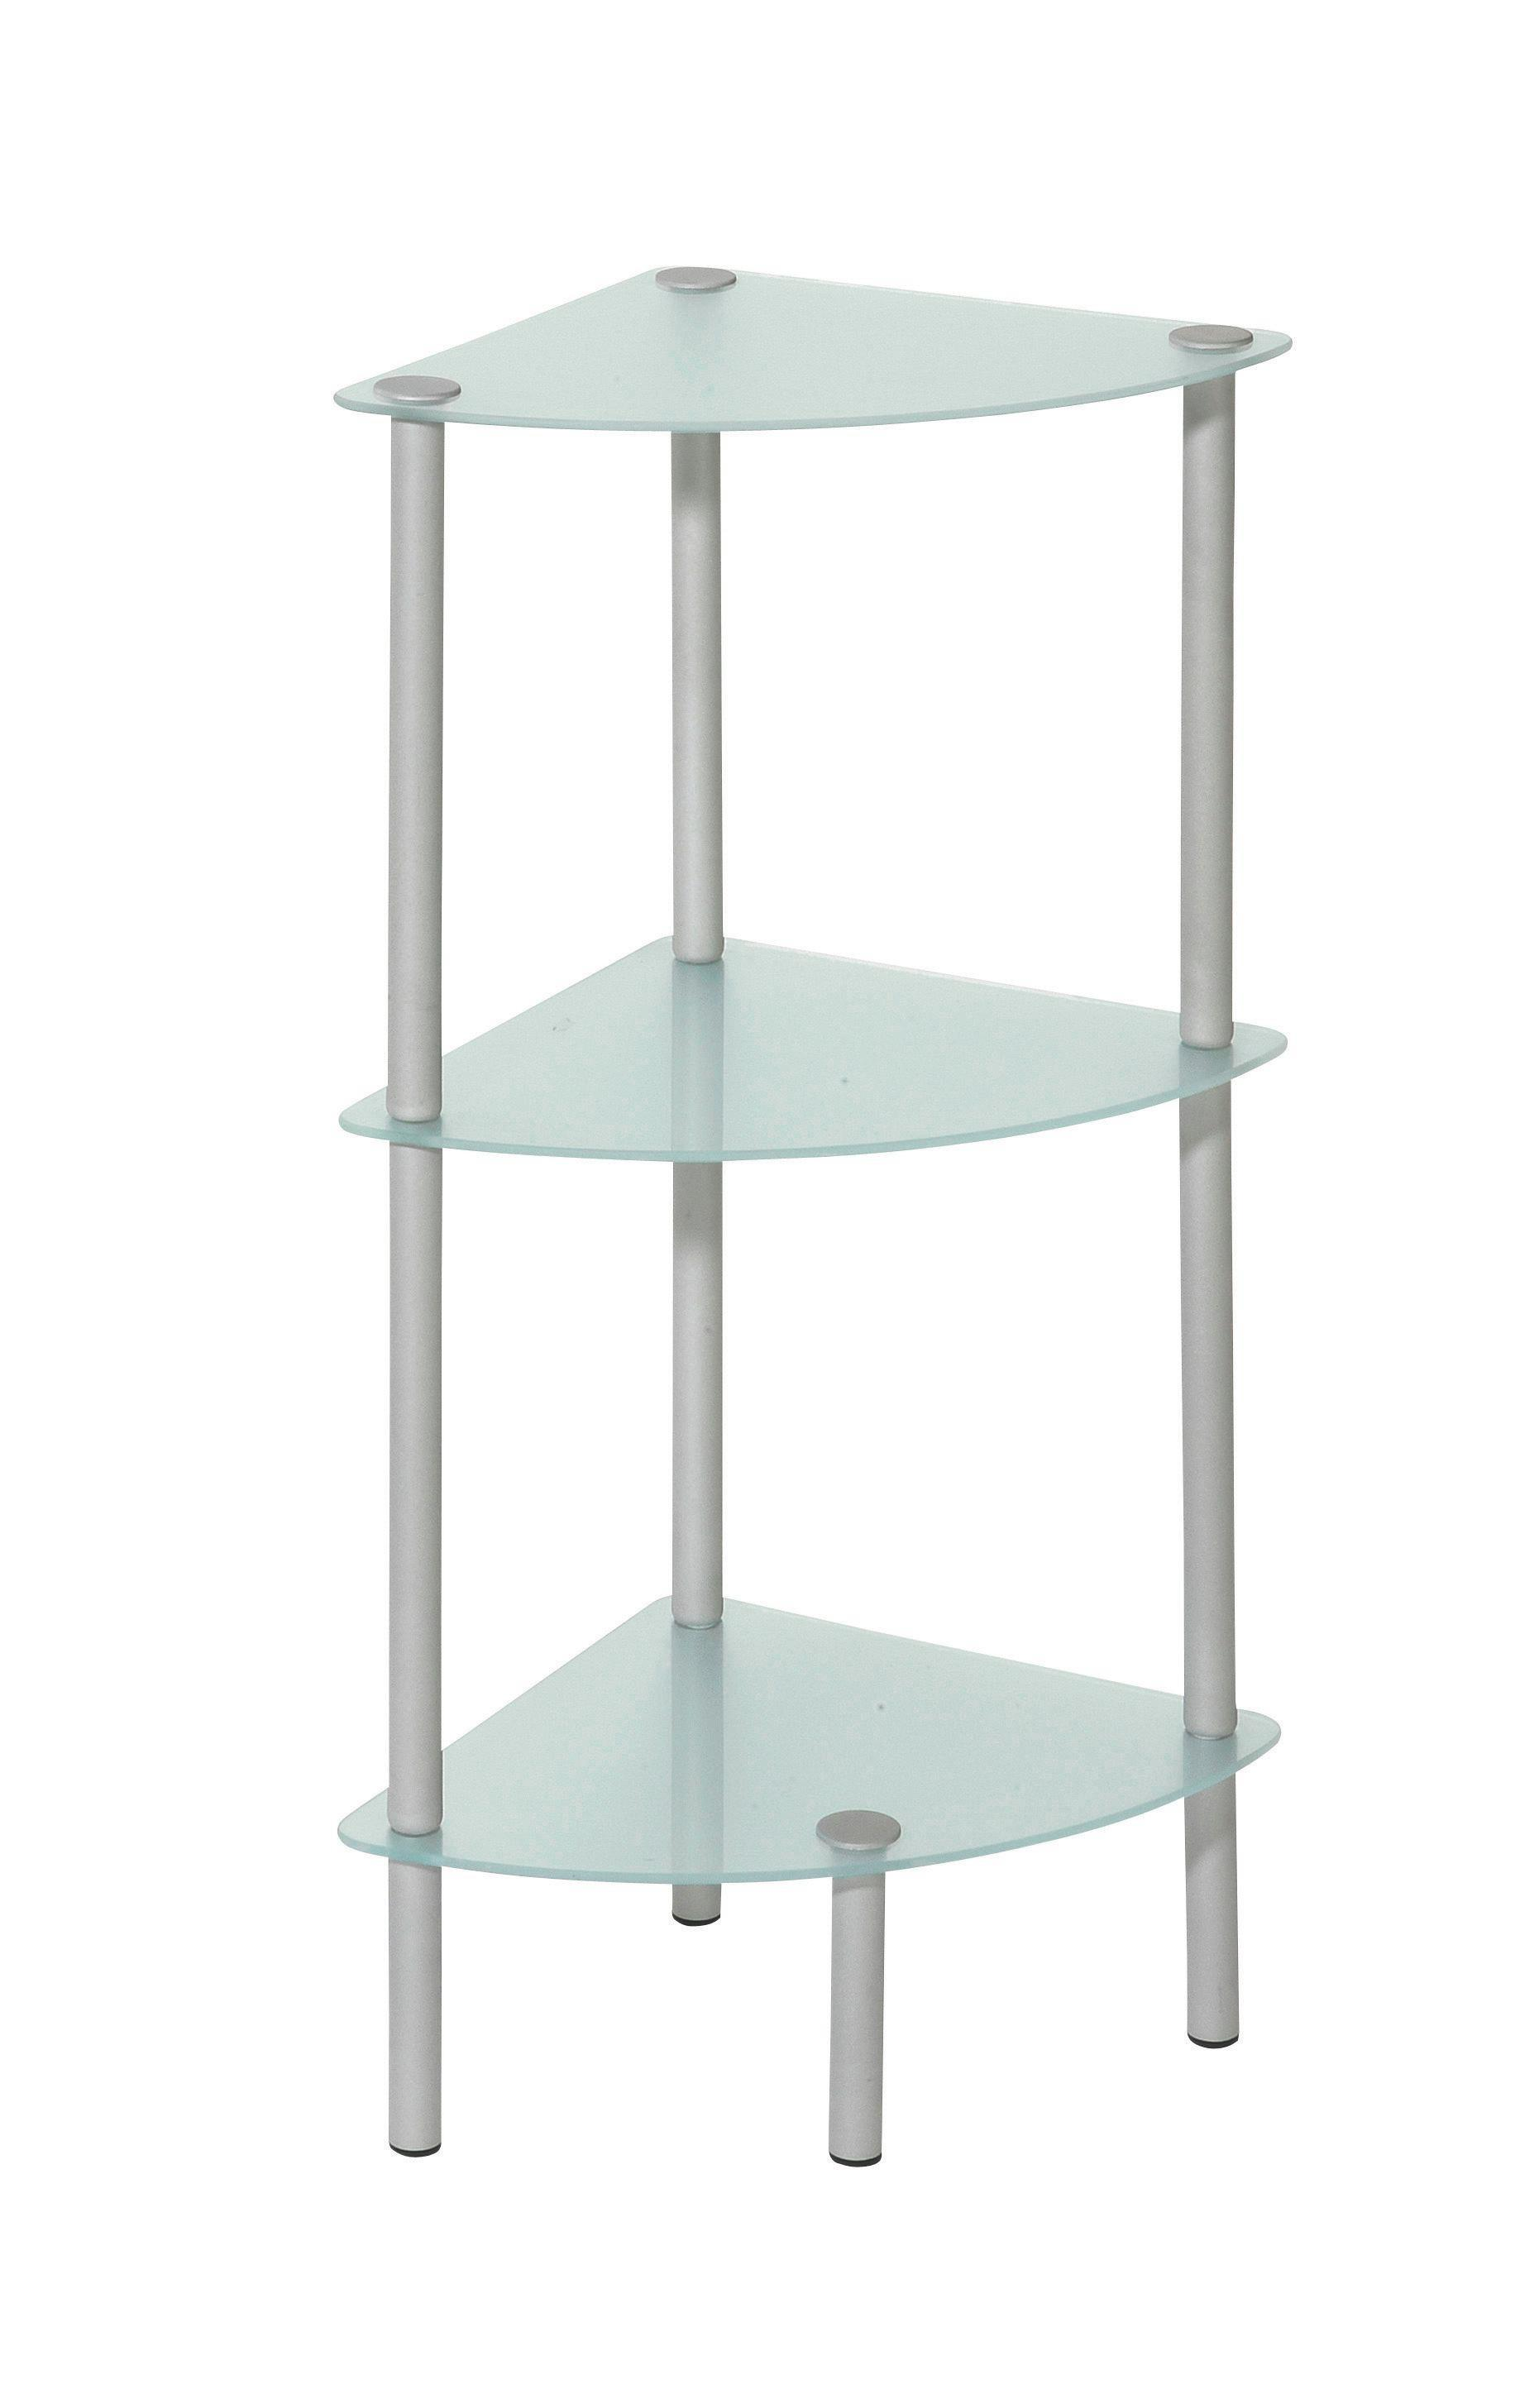 Badezimmerregal in Alufarben, 3 ablagen - Alufarben, Glas/Metall (30/74/30cm) - MÖMAX modern living